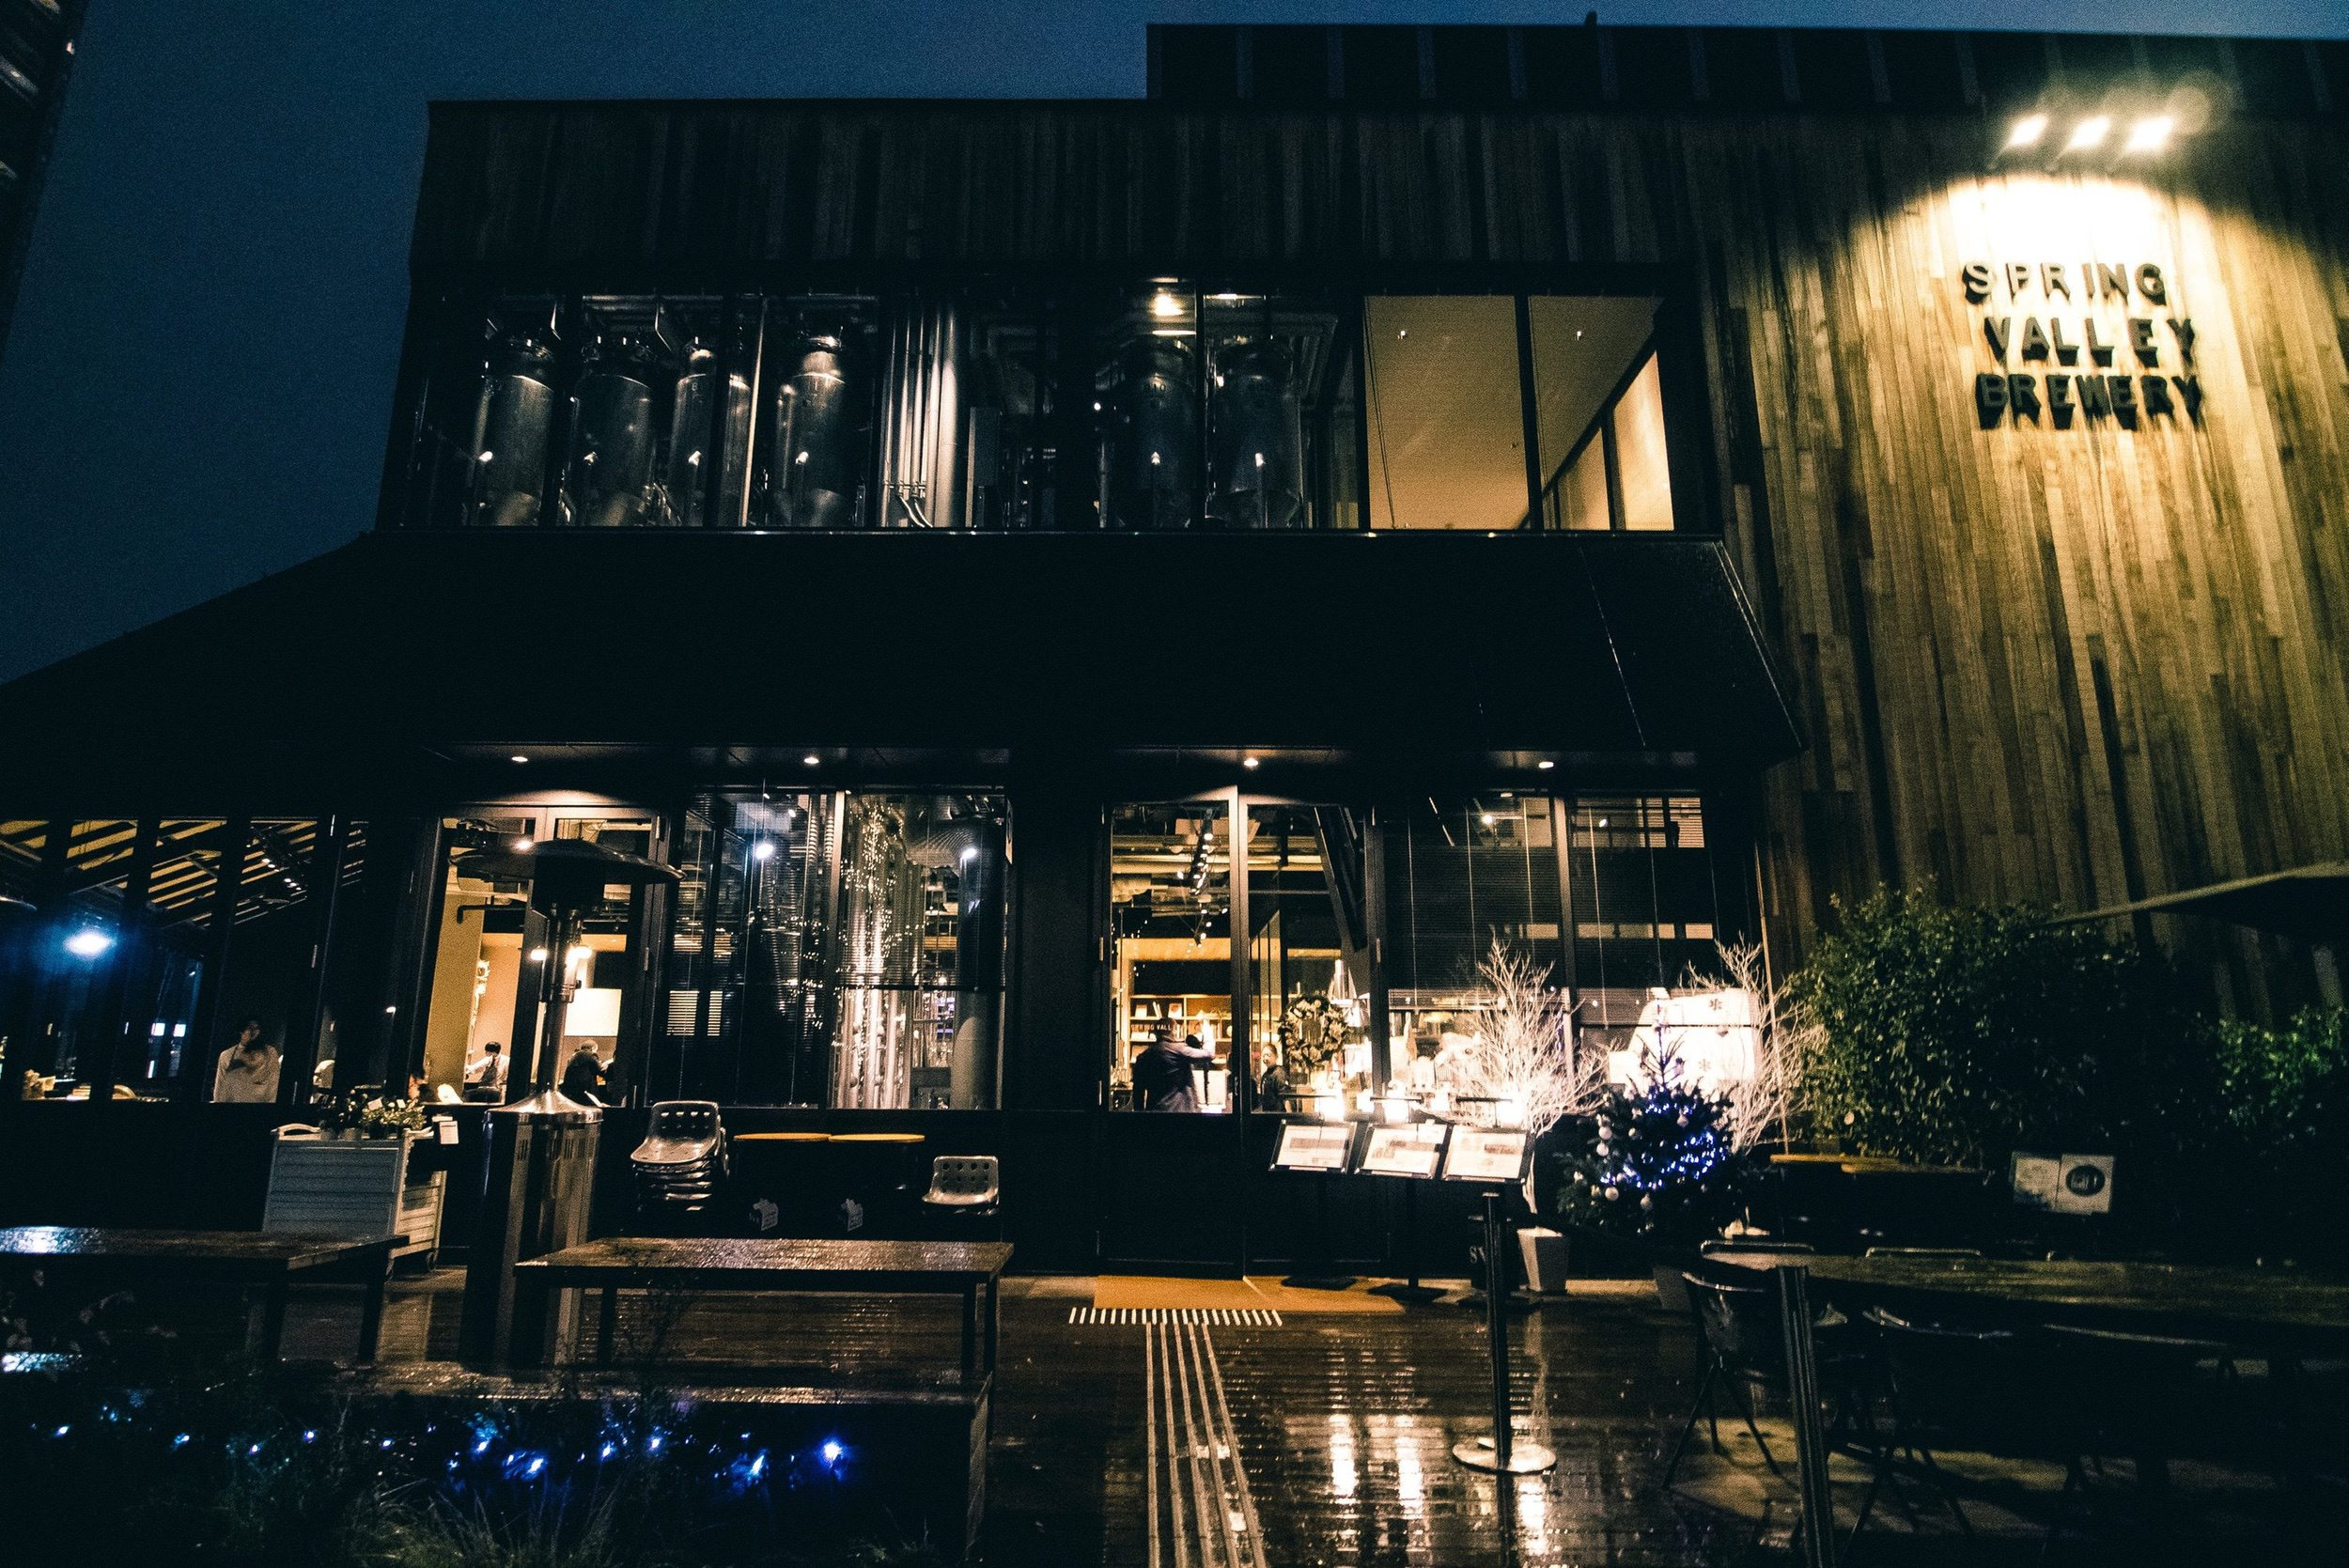 SPRING VALLEY BREWERY TOKYO